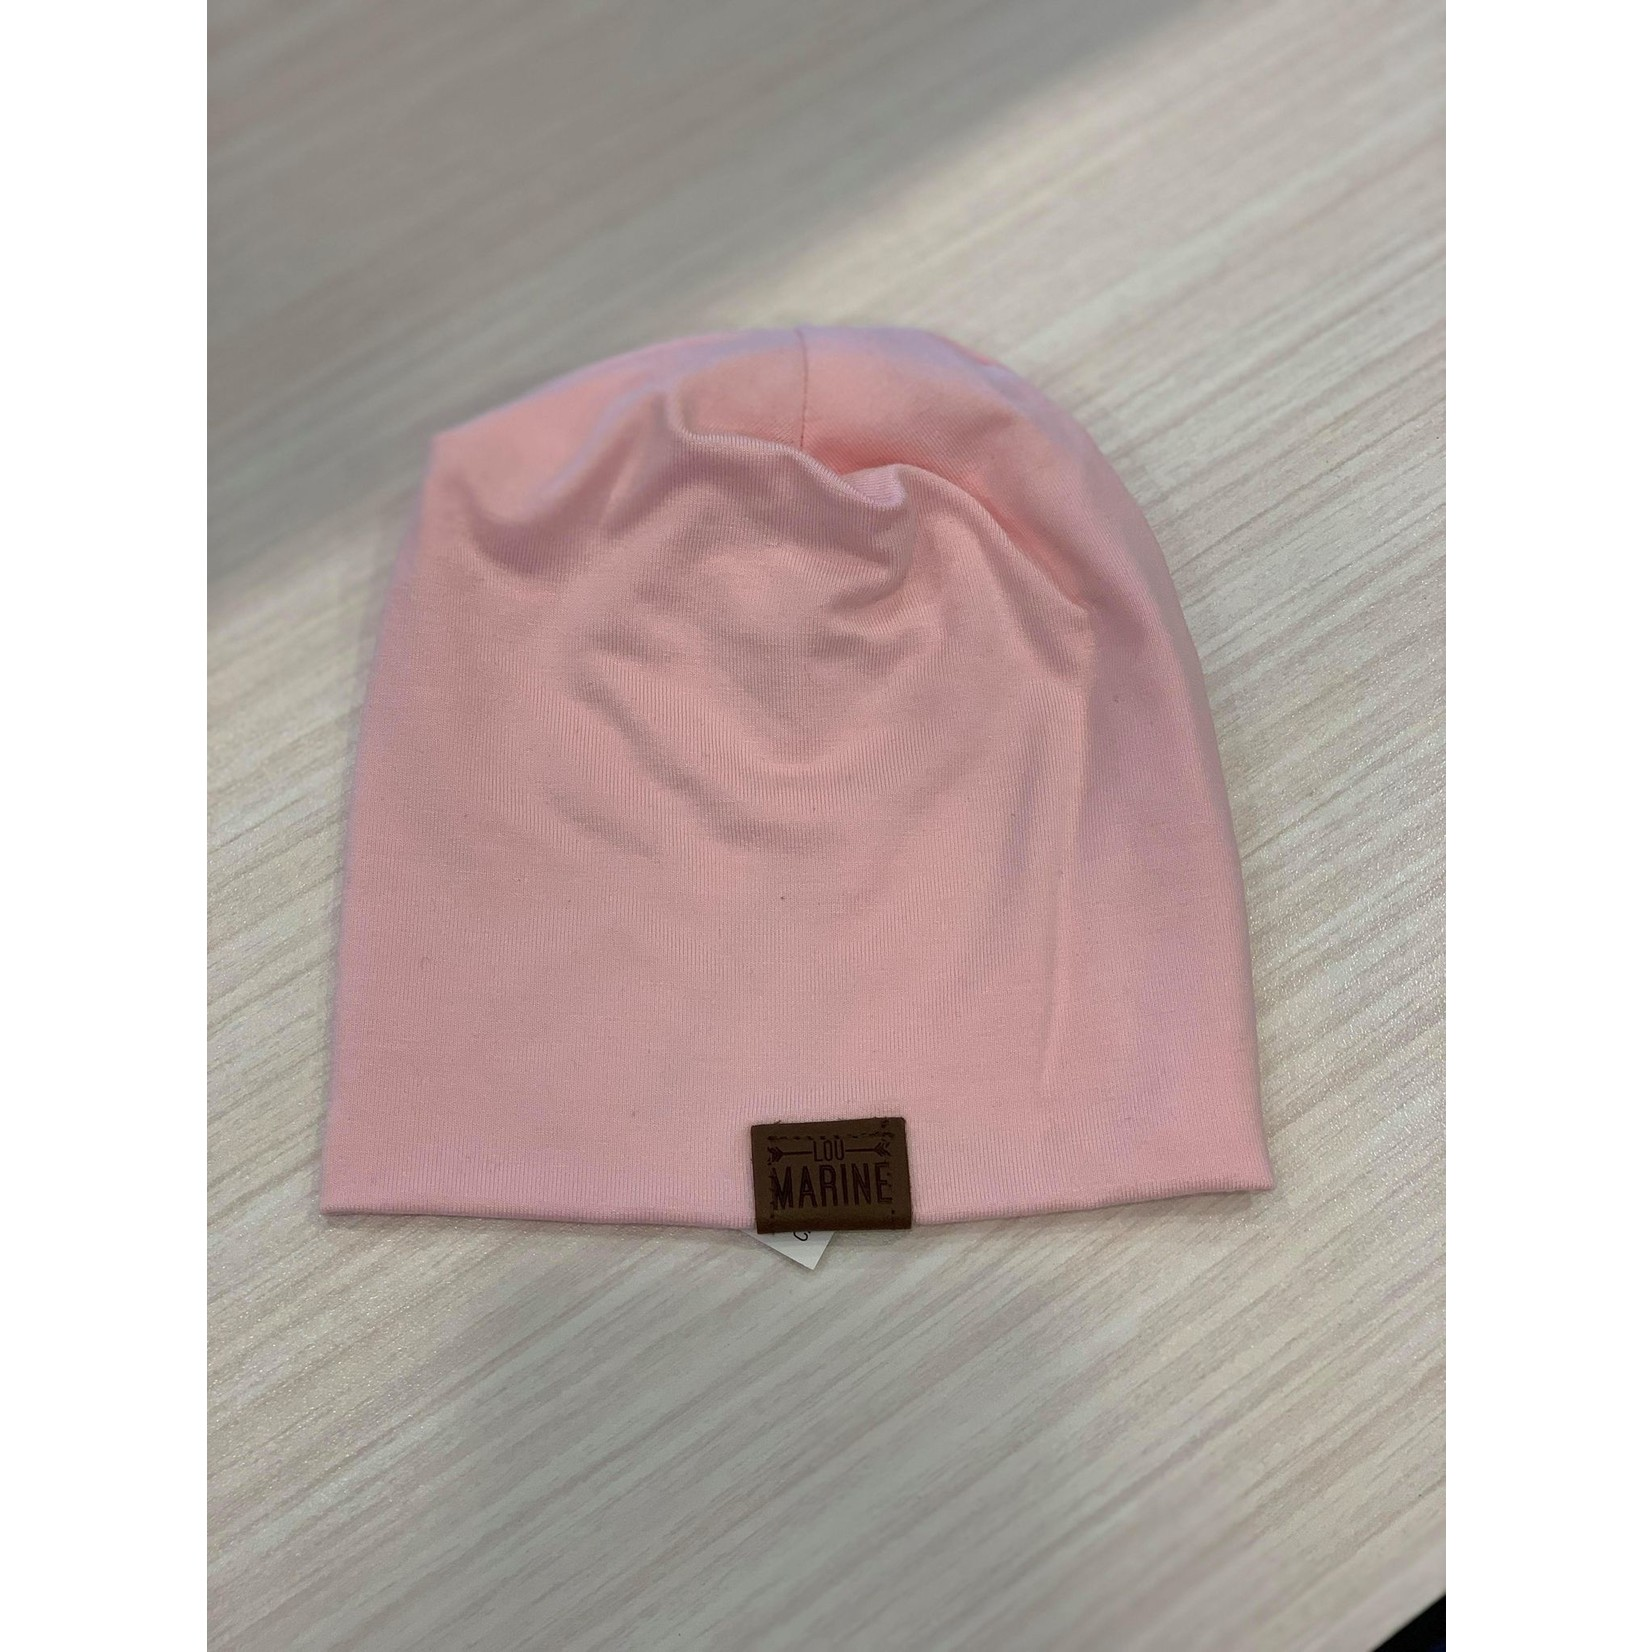 Lou Marine    Tuque  0-3 M  Rose Pâle